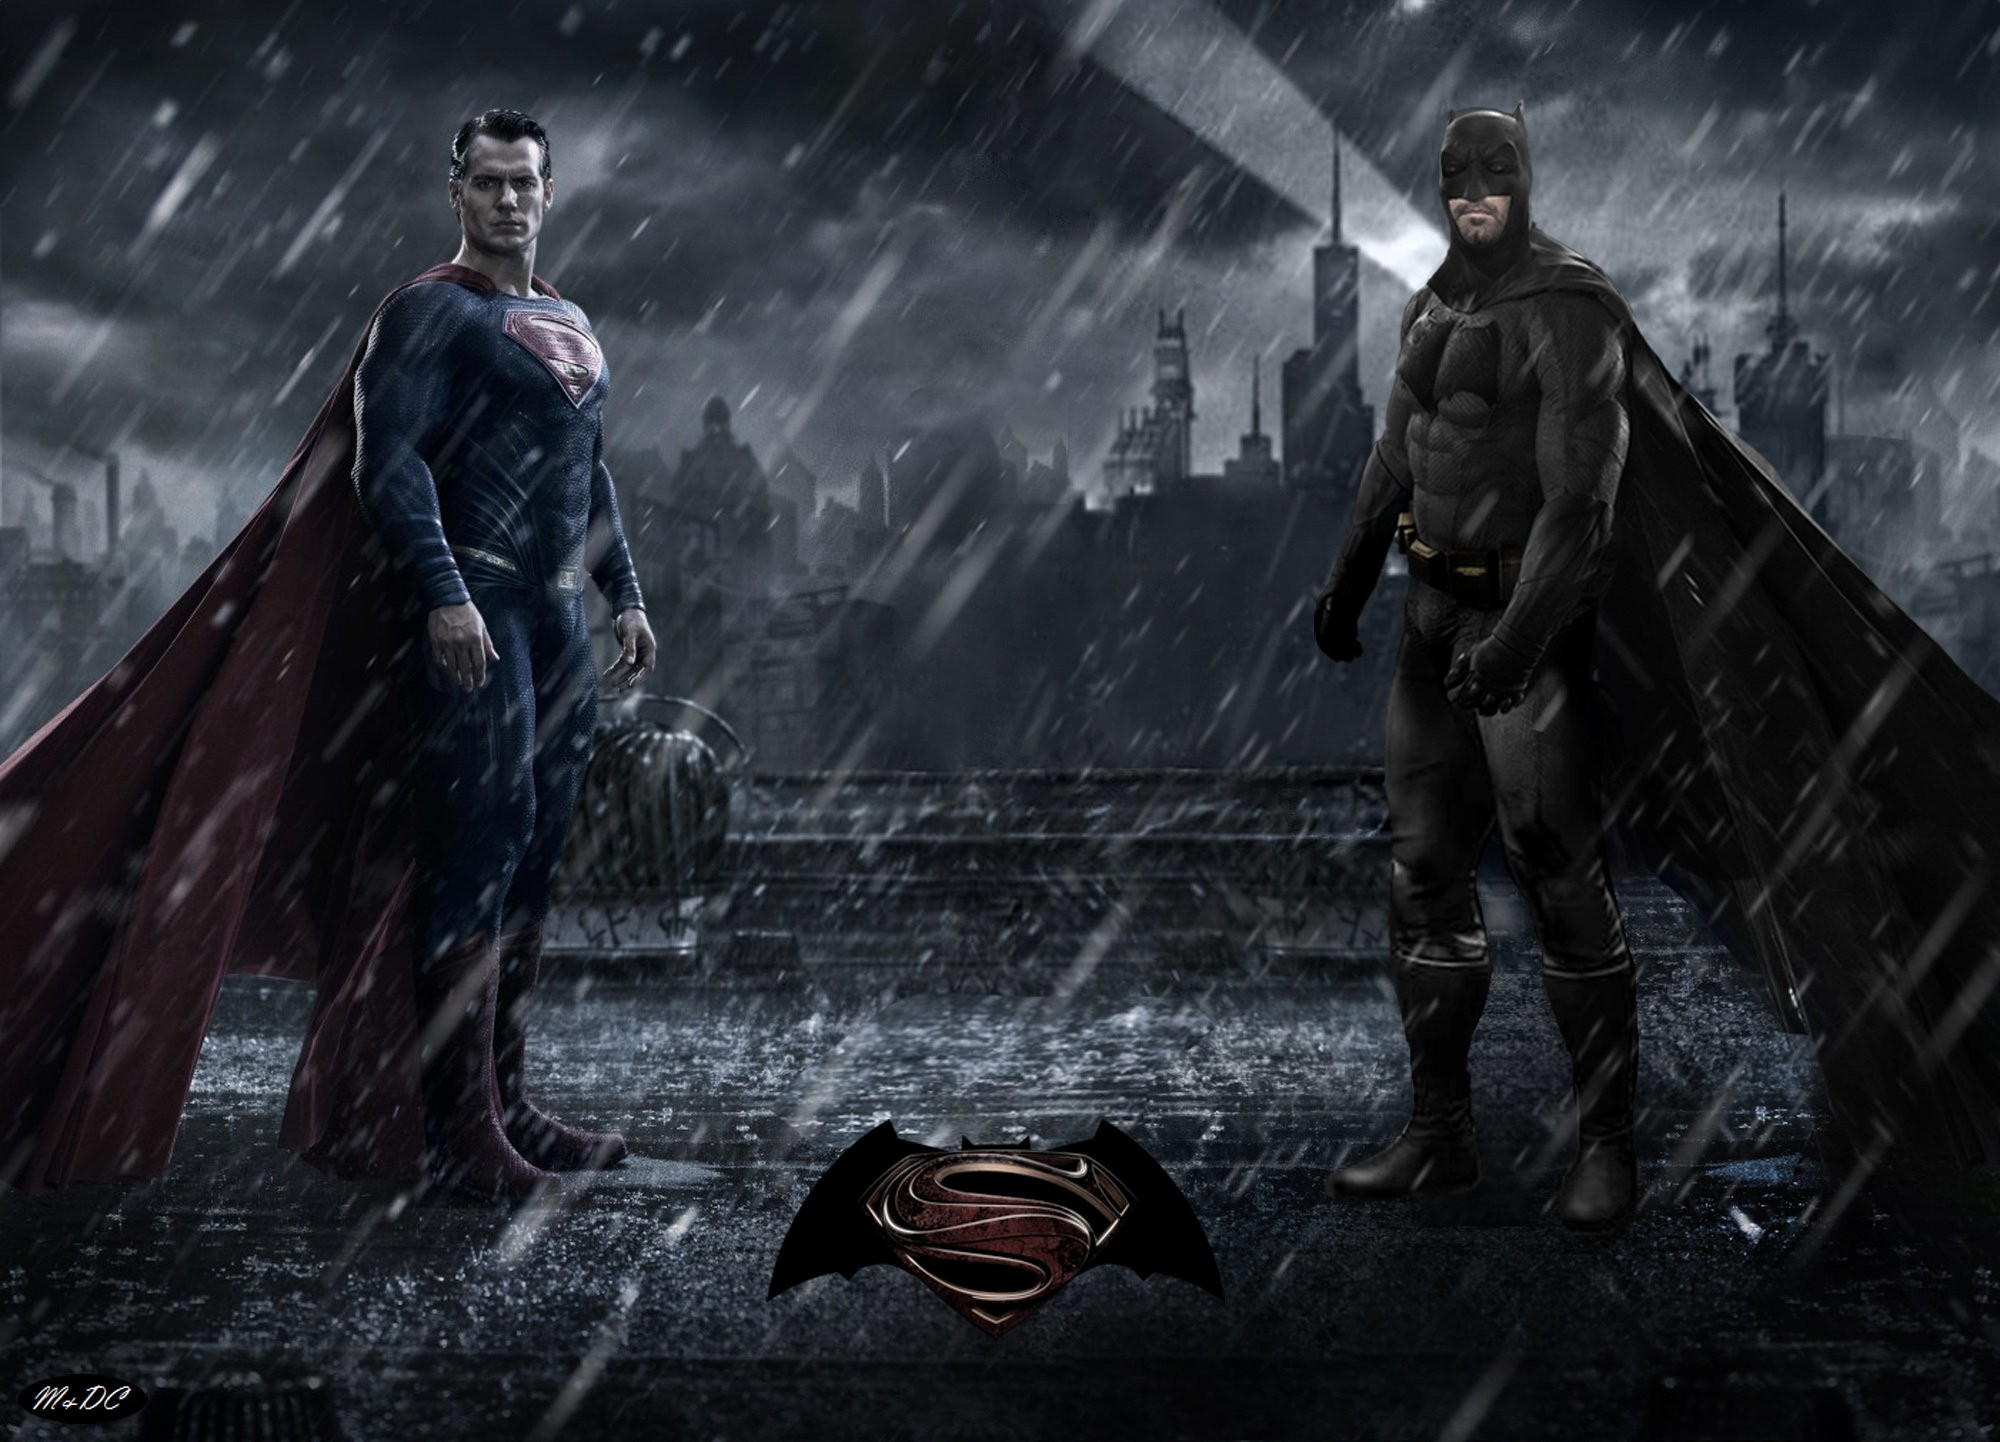 Batman Vs Superman Dawn Of Justice Wallpapers High Quality